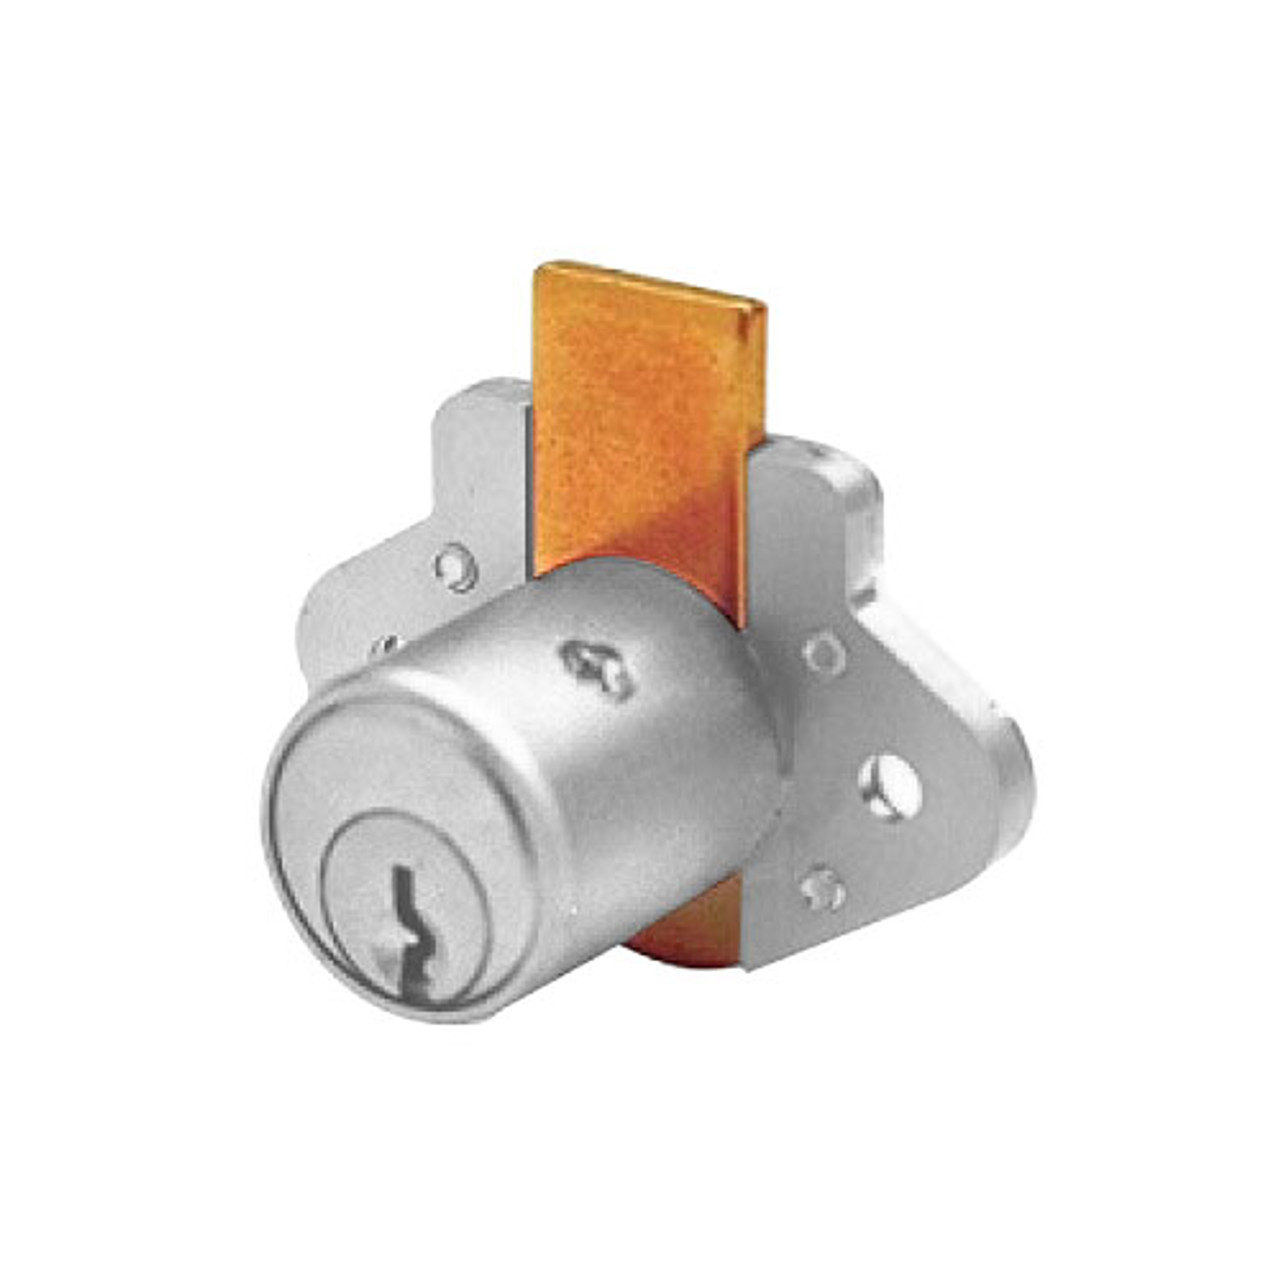 Olympus N078-KA915-26D Cabinet Lock Diamond Back Drawer Lock in Satin Chrome Finish